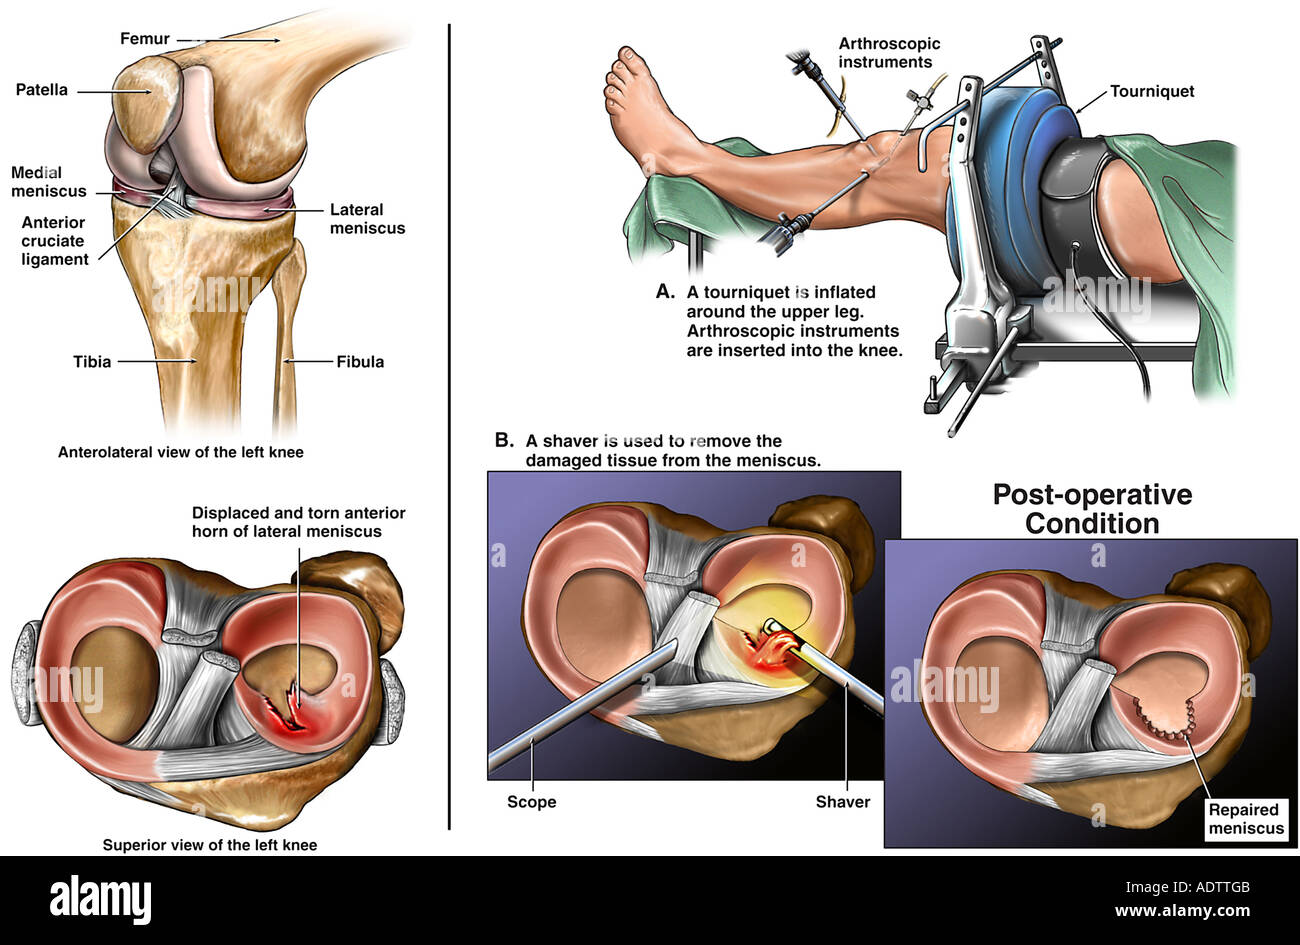 Cartilage Tear Stockfotos & Cartilage Tear Bilder - Alamy